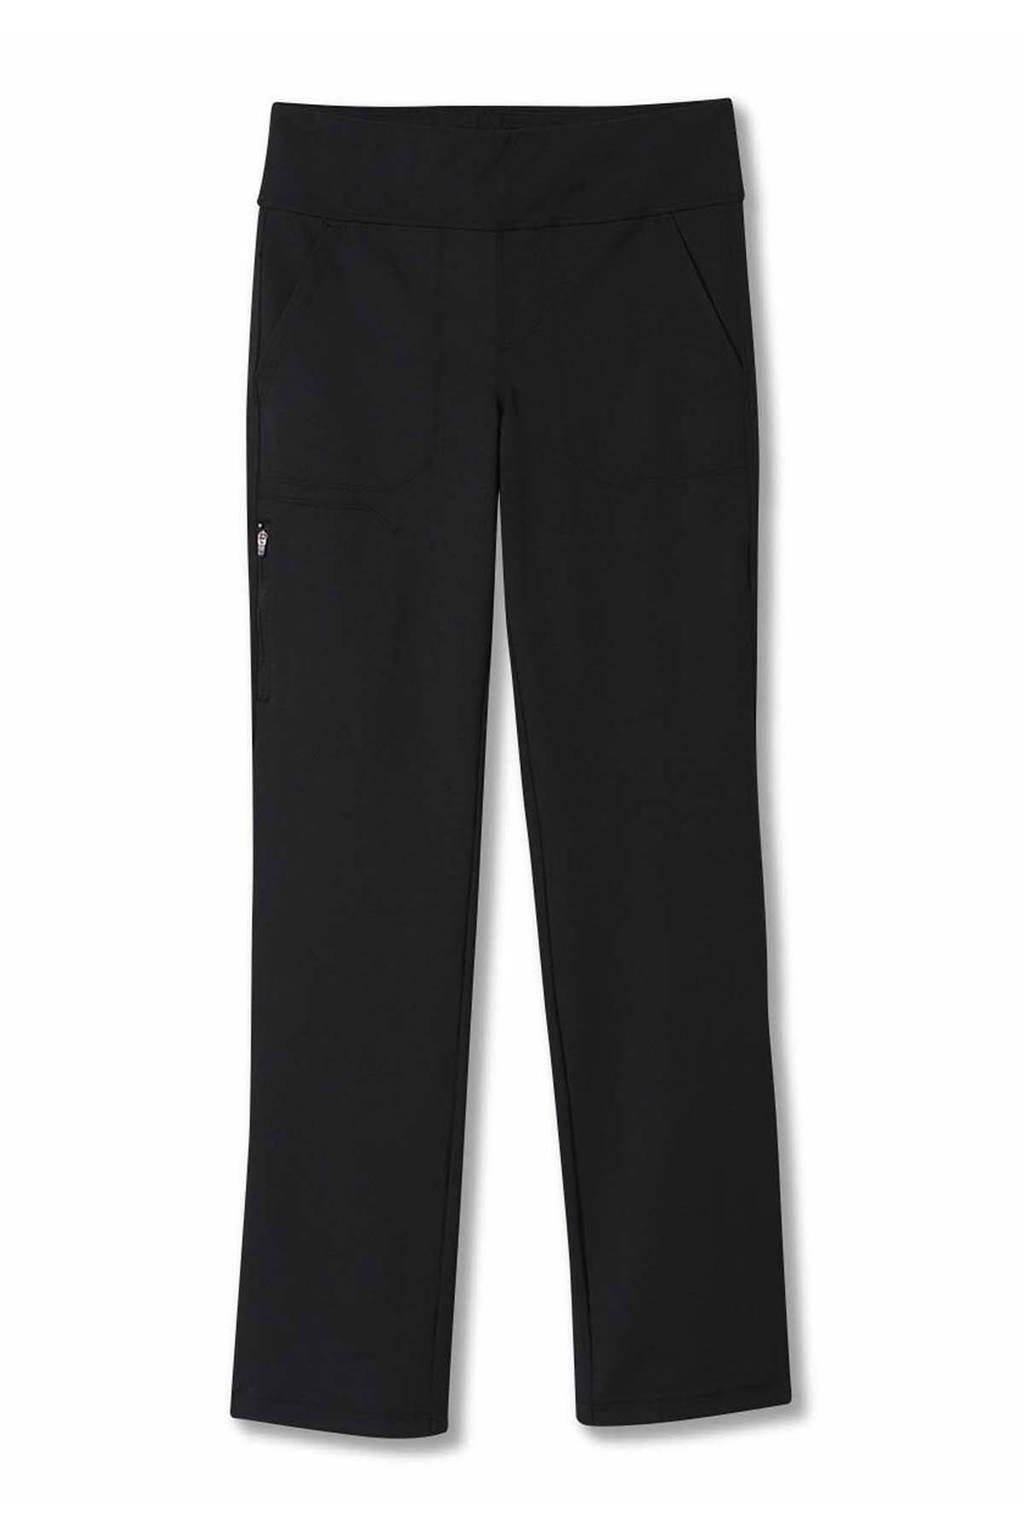 Royal Robbins outdoorbroek Jammer Knit Pant II zwart, Jet Black